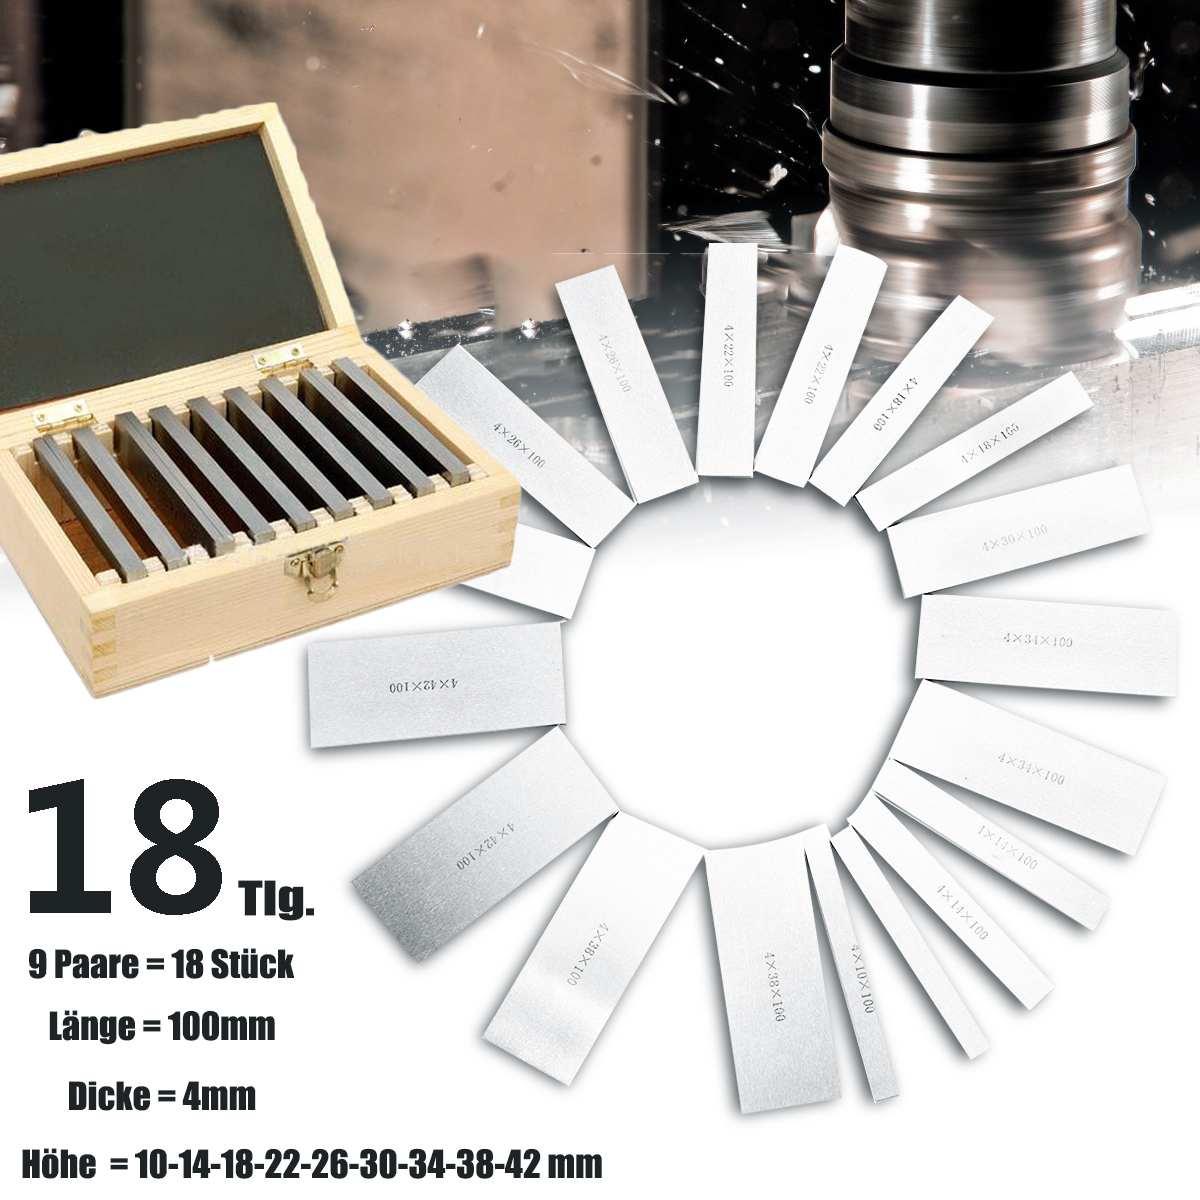 9 Pairs 18Pcs High-präzision Hergestellt Parallel Pad Gauge Block CNC Fräsen Pads Set 100mm x (10-42mm) stahl Leicht Tragen